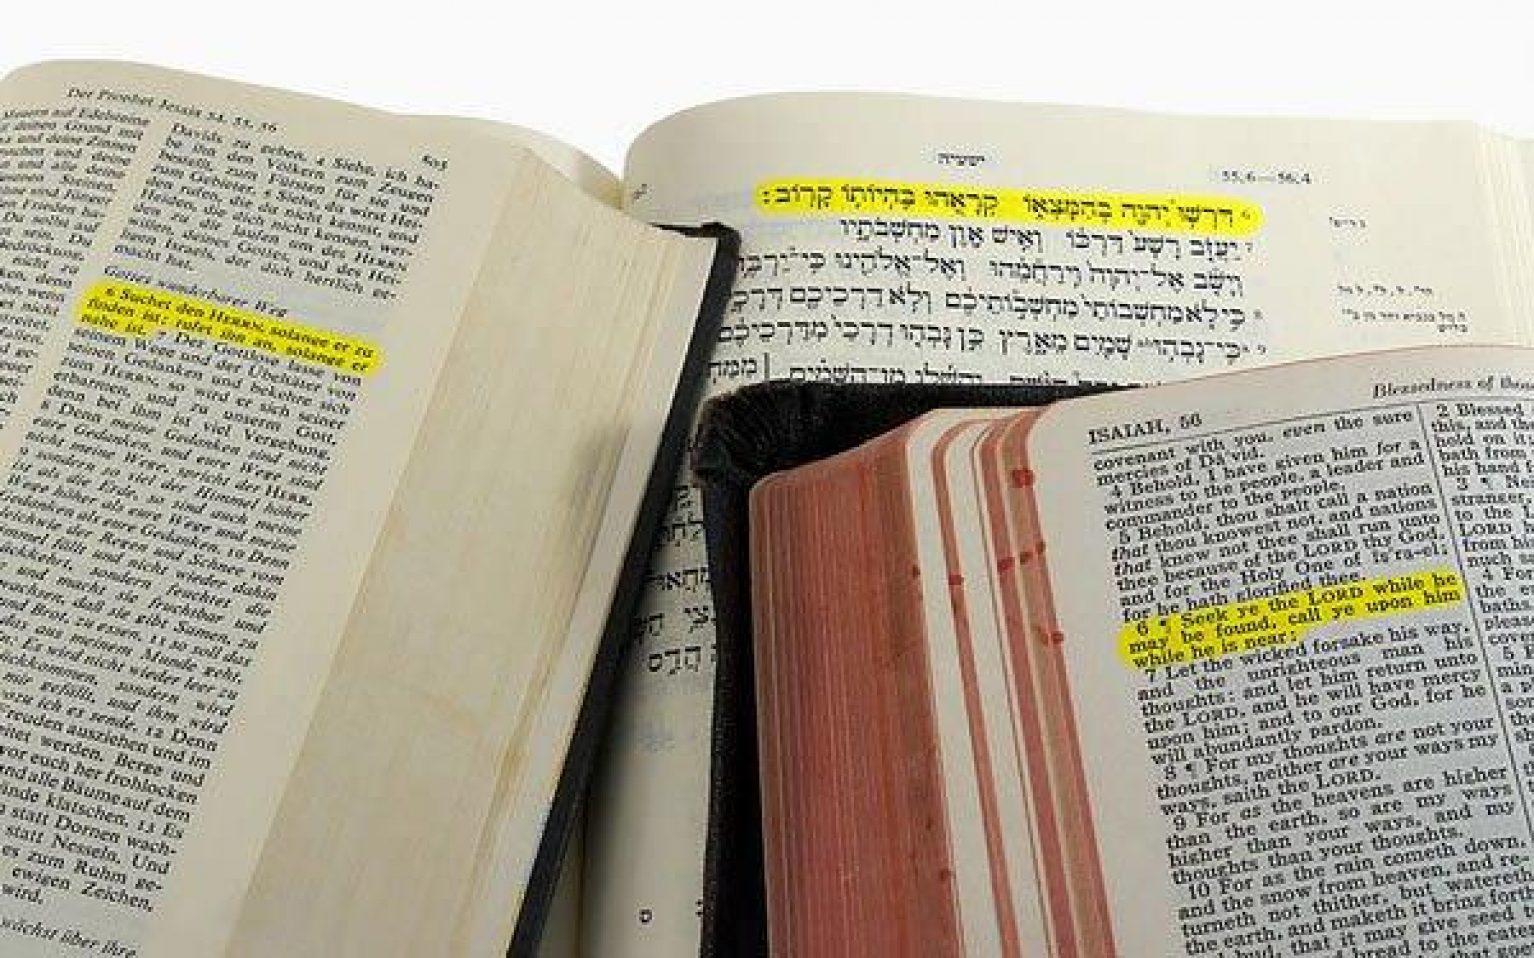 bible-translation-issues-767x4792x